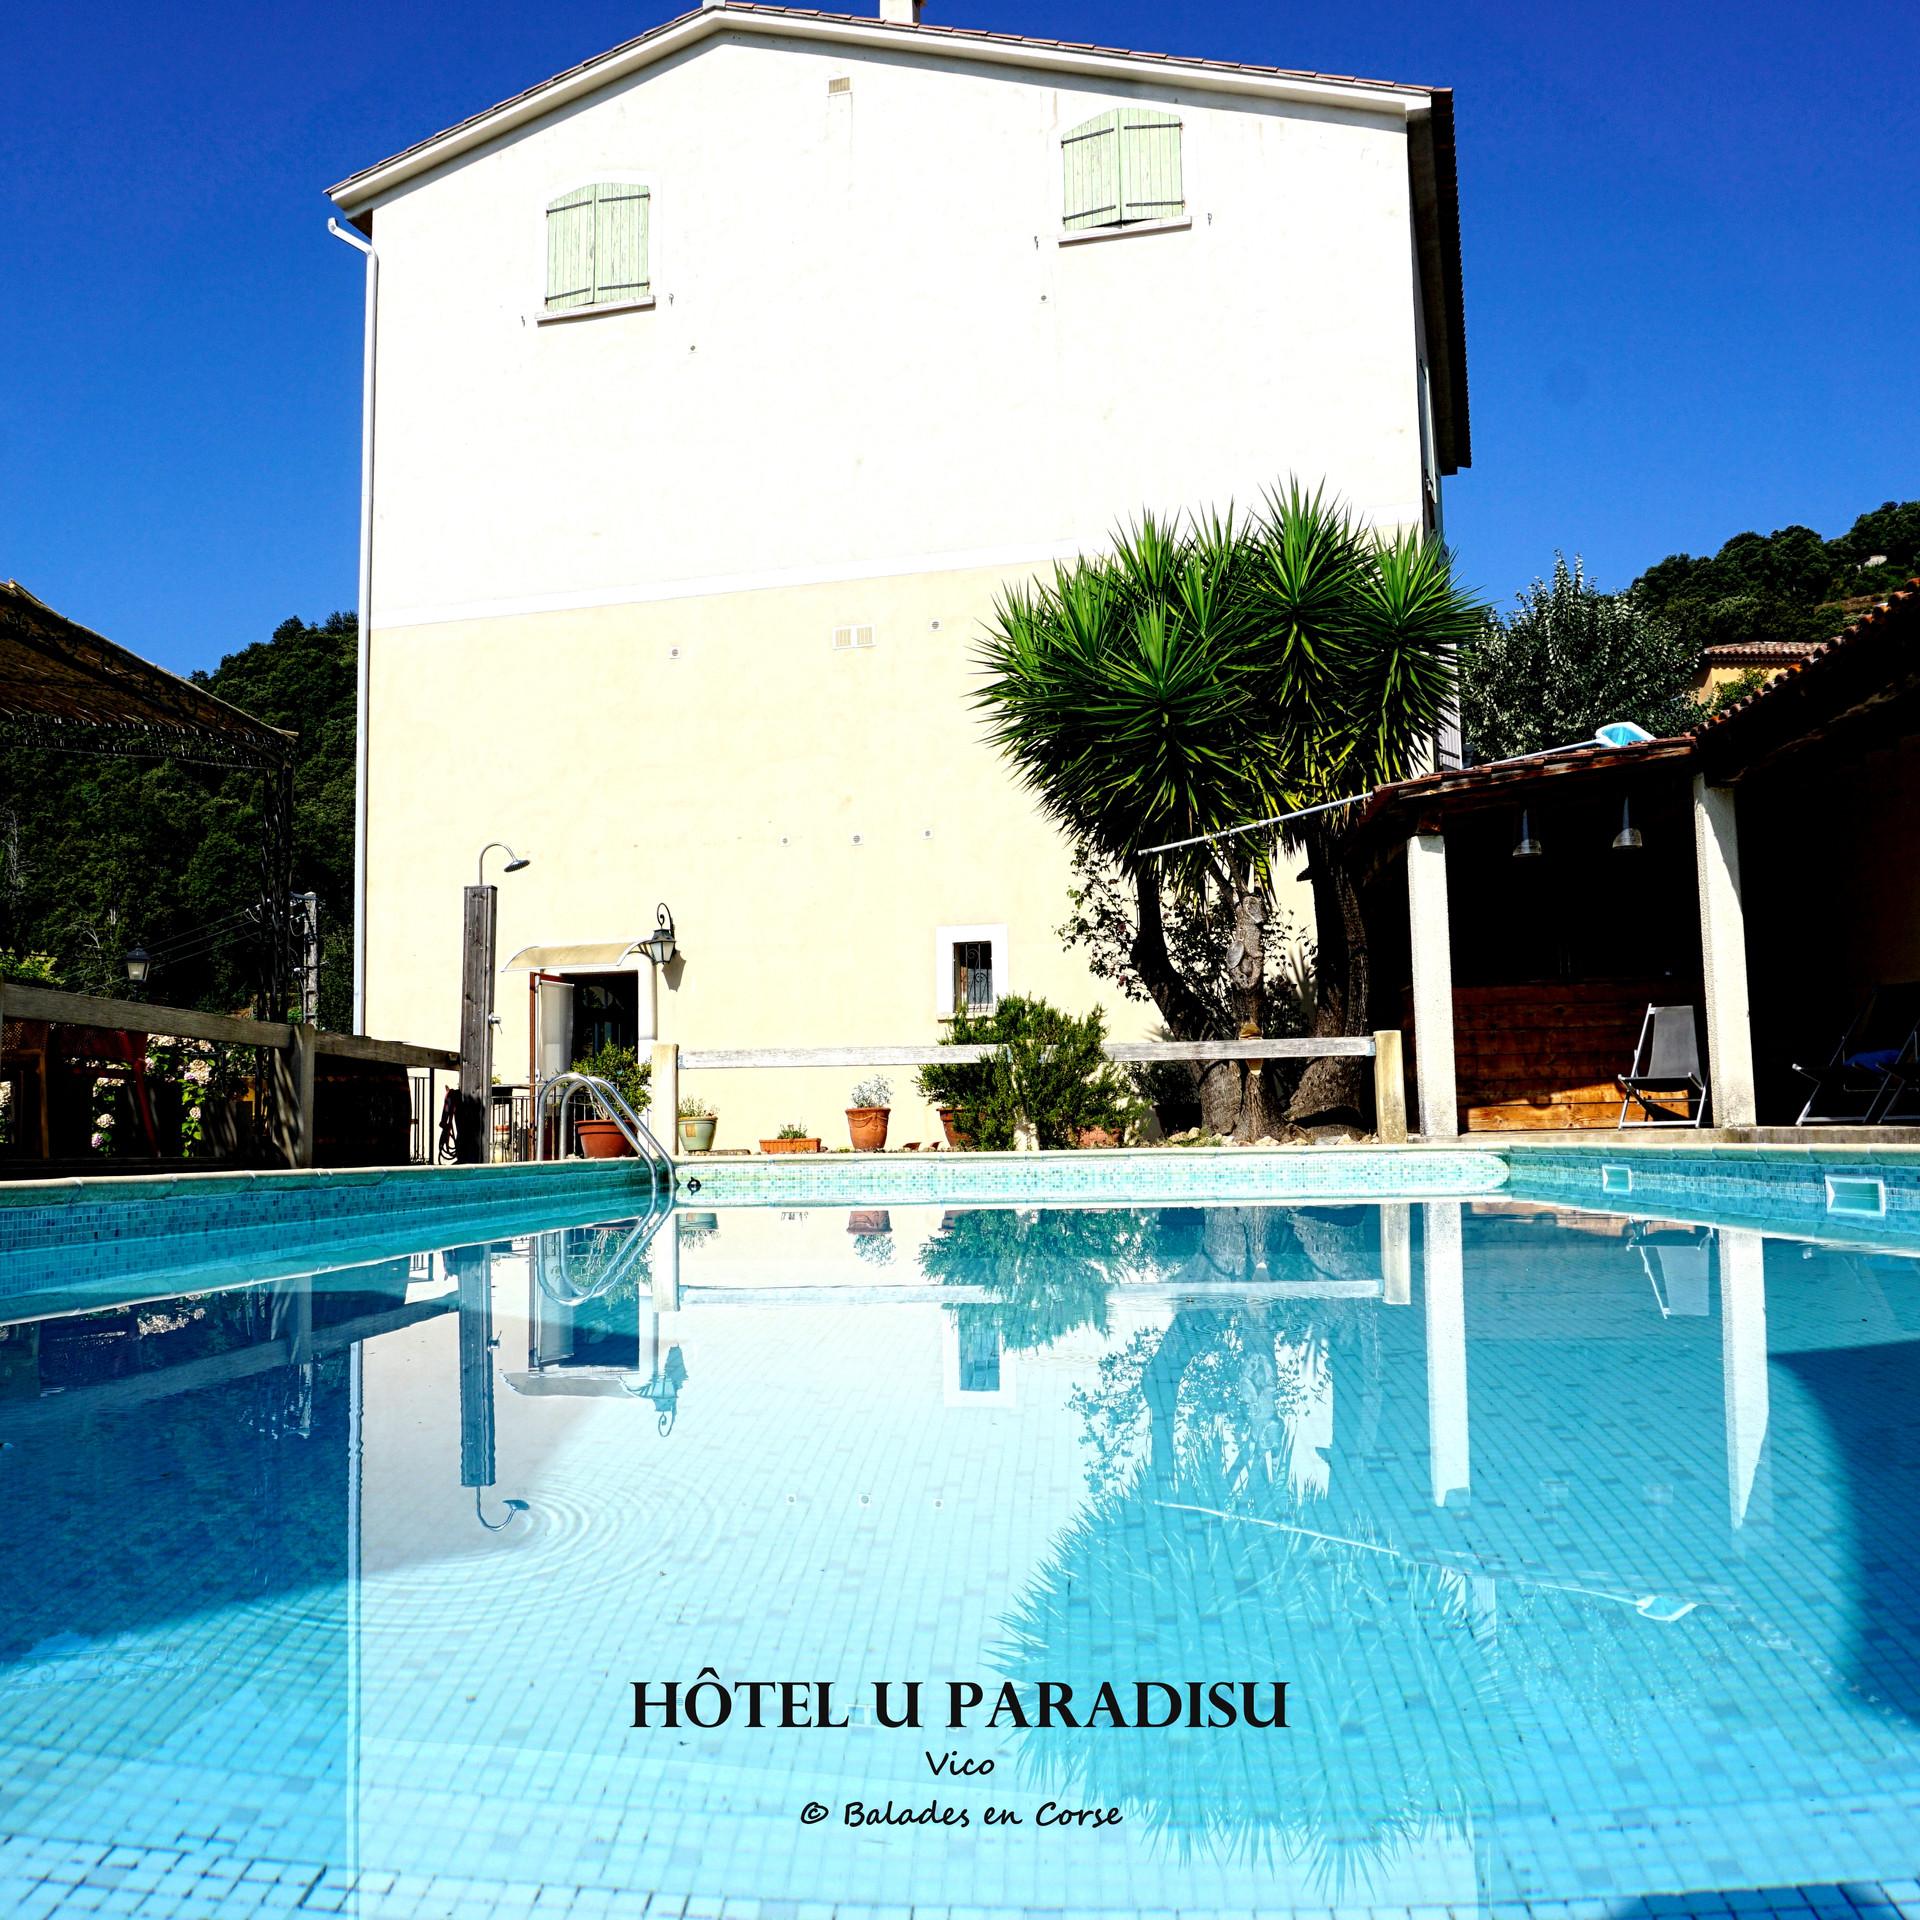 Hôtel U Paradisu Vico